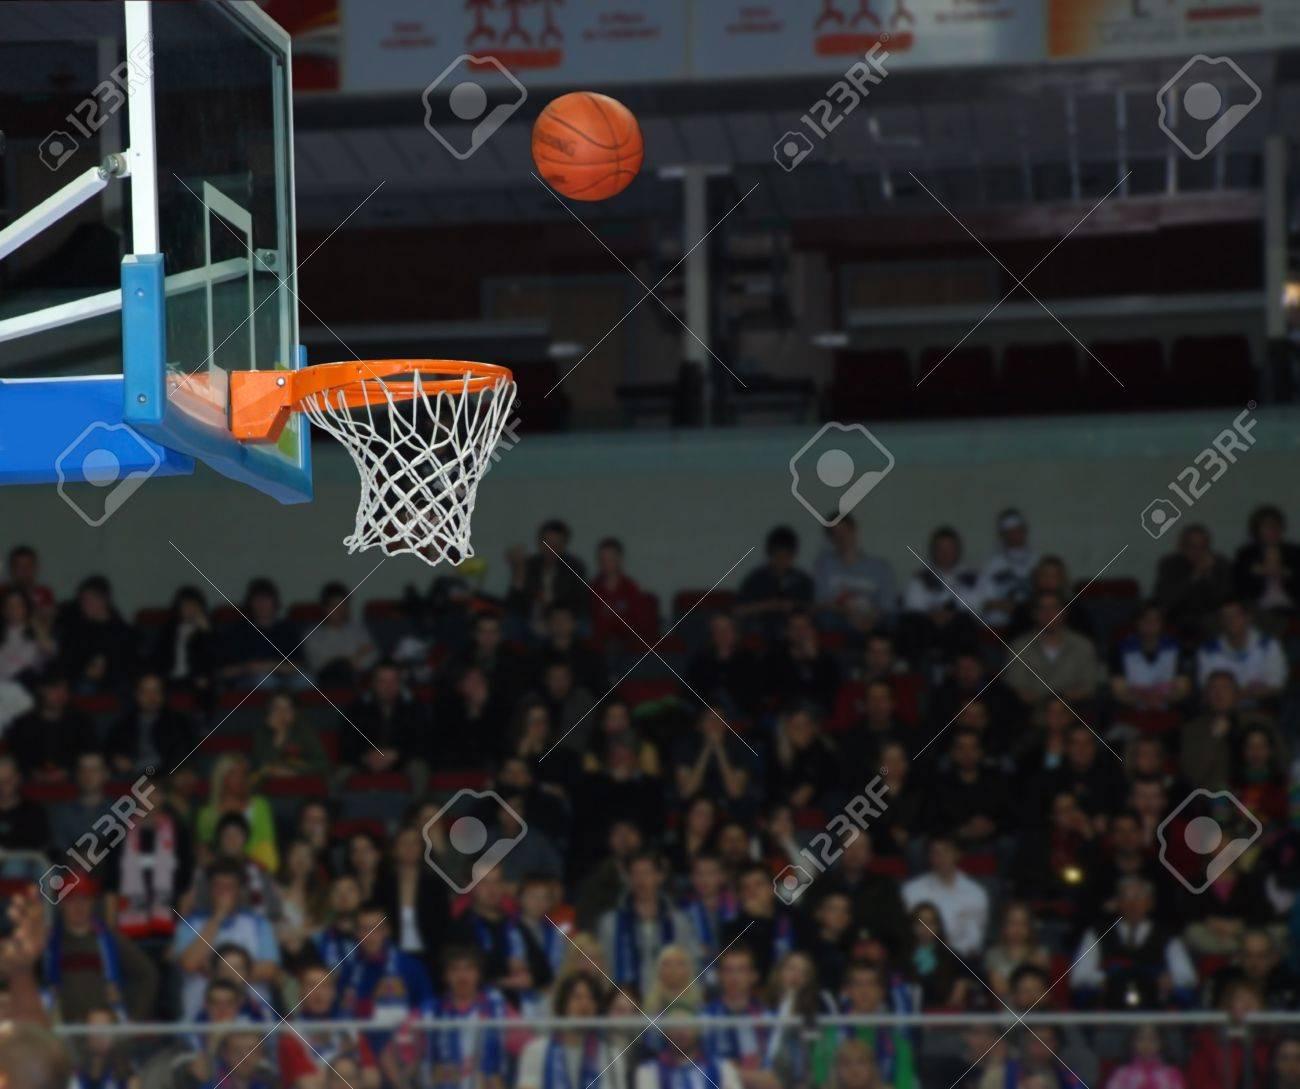 Basketball, exact throw of a ball in a basket - 5787204